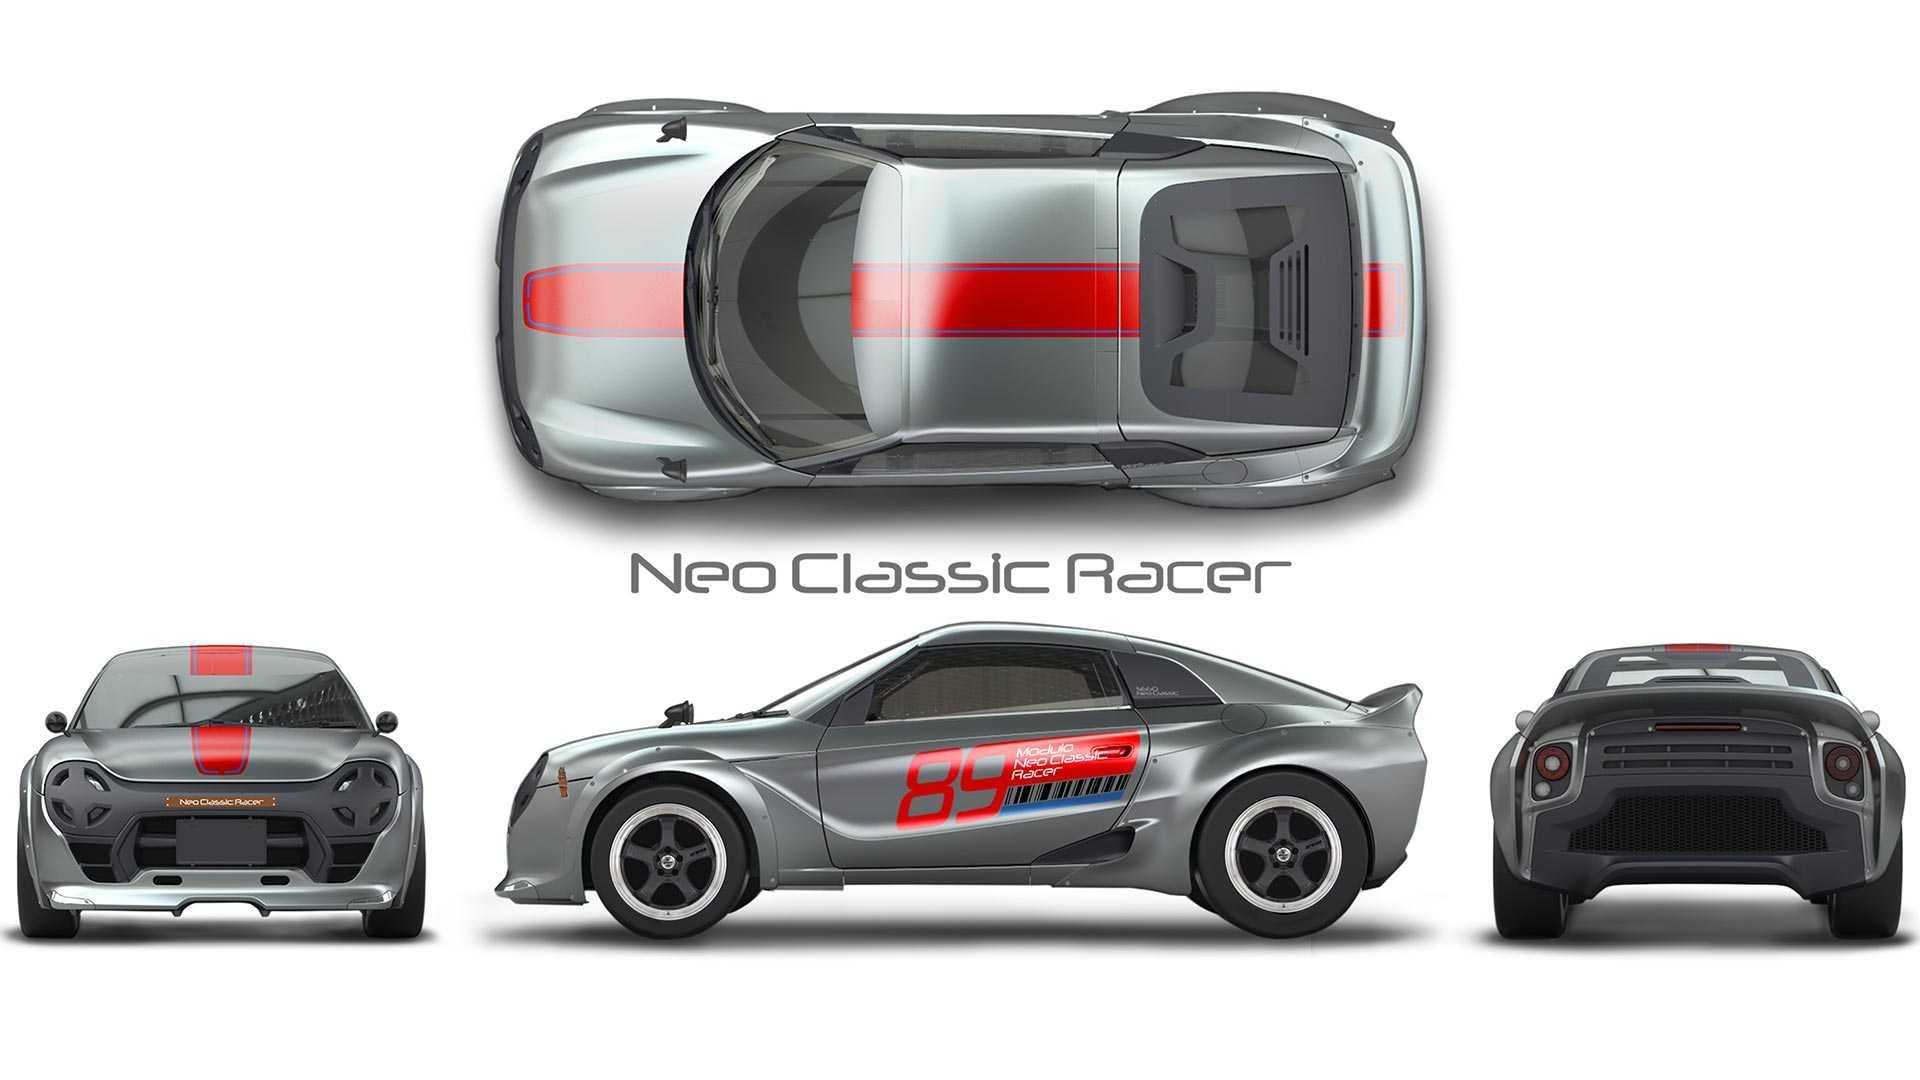 honda-s660-neo-classic-racer-concept (2)